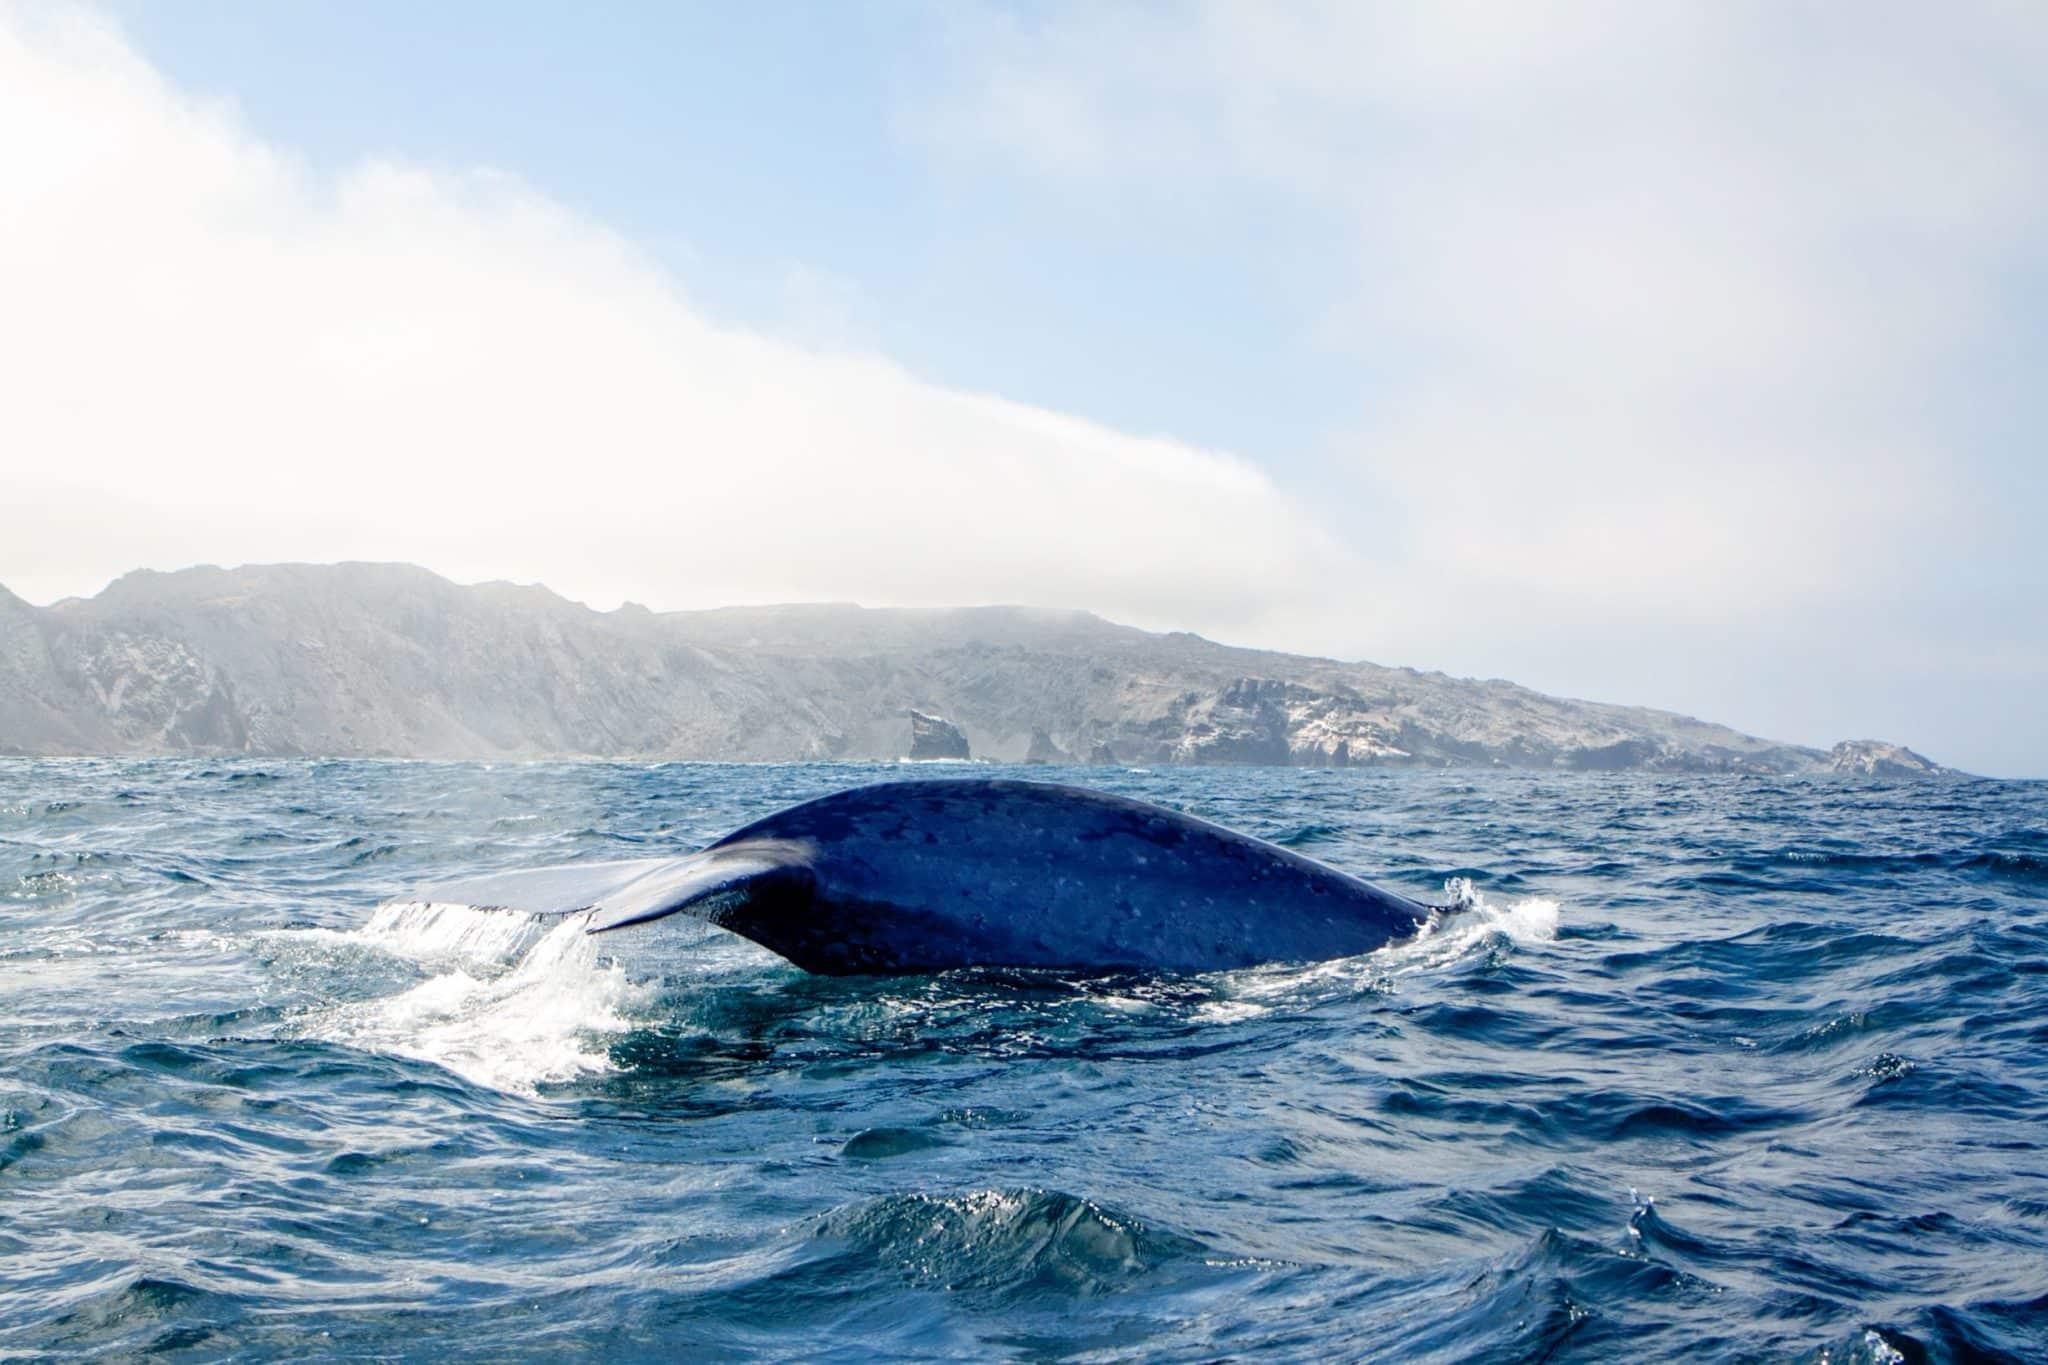 baleine nord chili pas cher